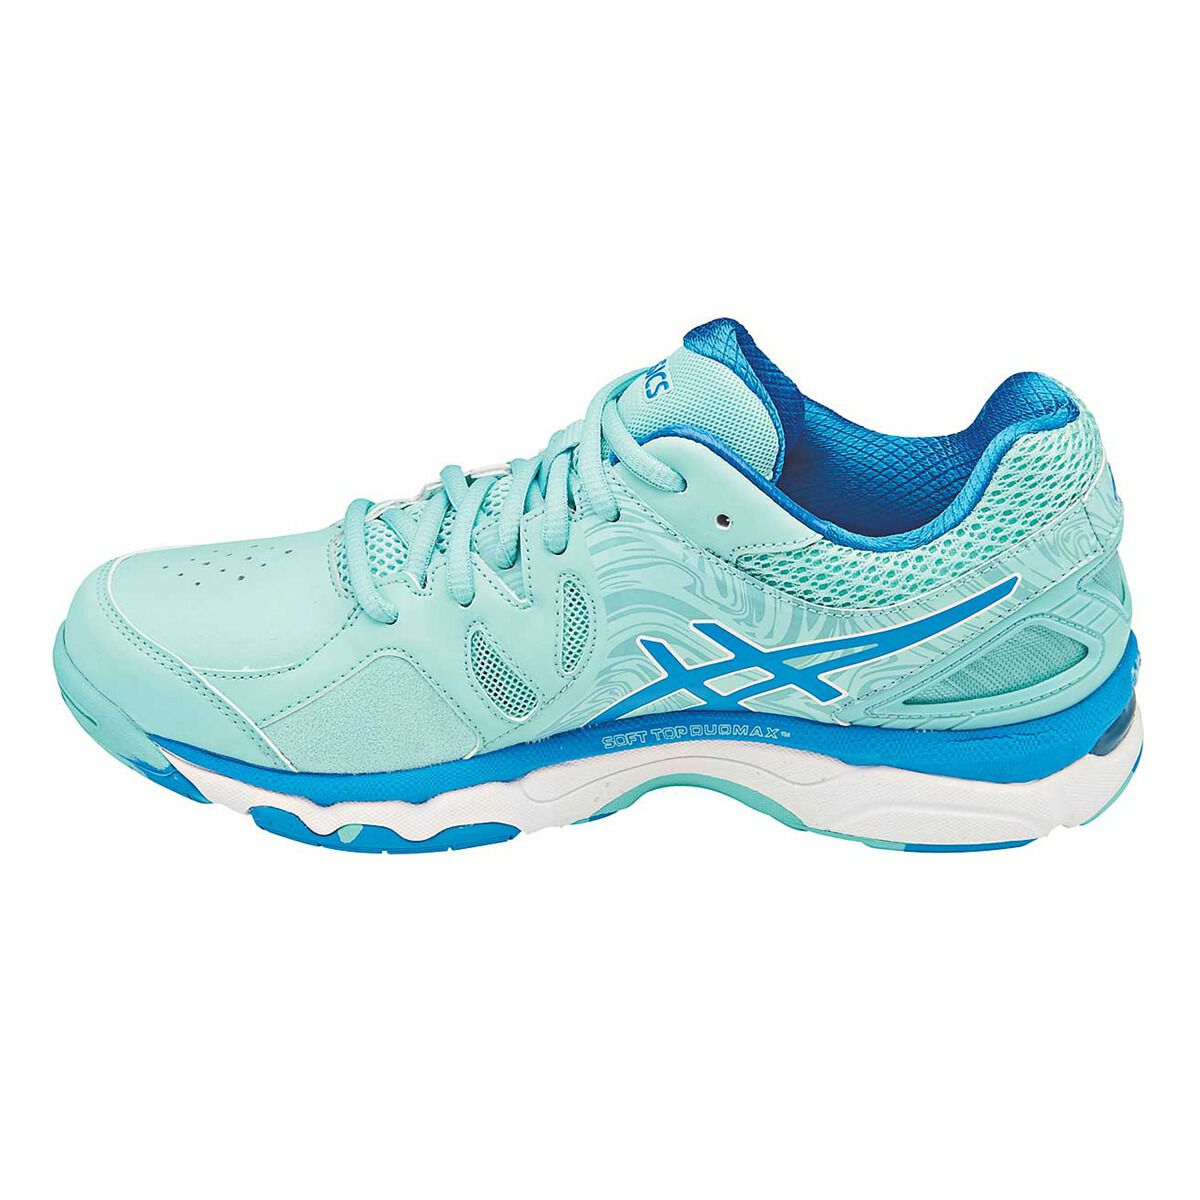 Chaussures Asics 7 Gel Netburner Super 7 Femmes Aqua Femmes/ Chaussures Blanc US 2909e31 - wisespend.website